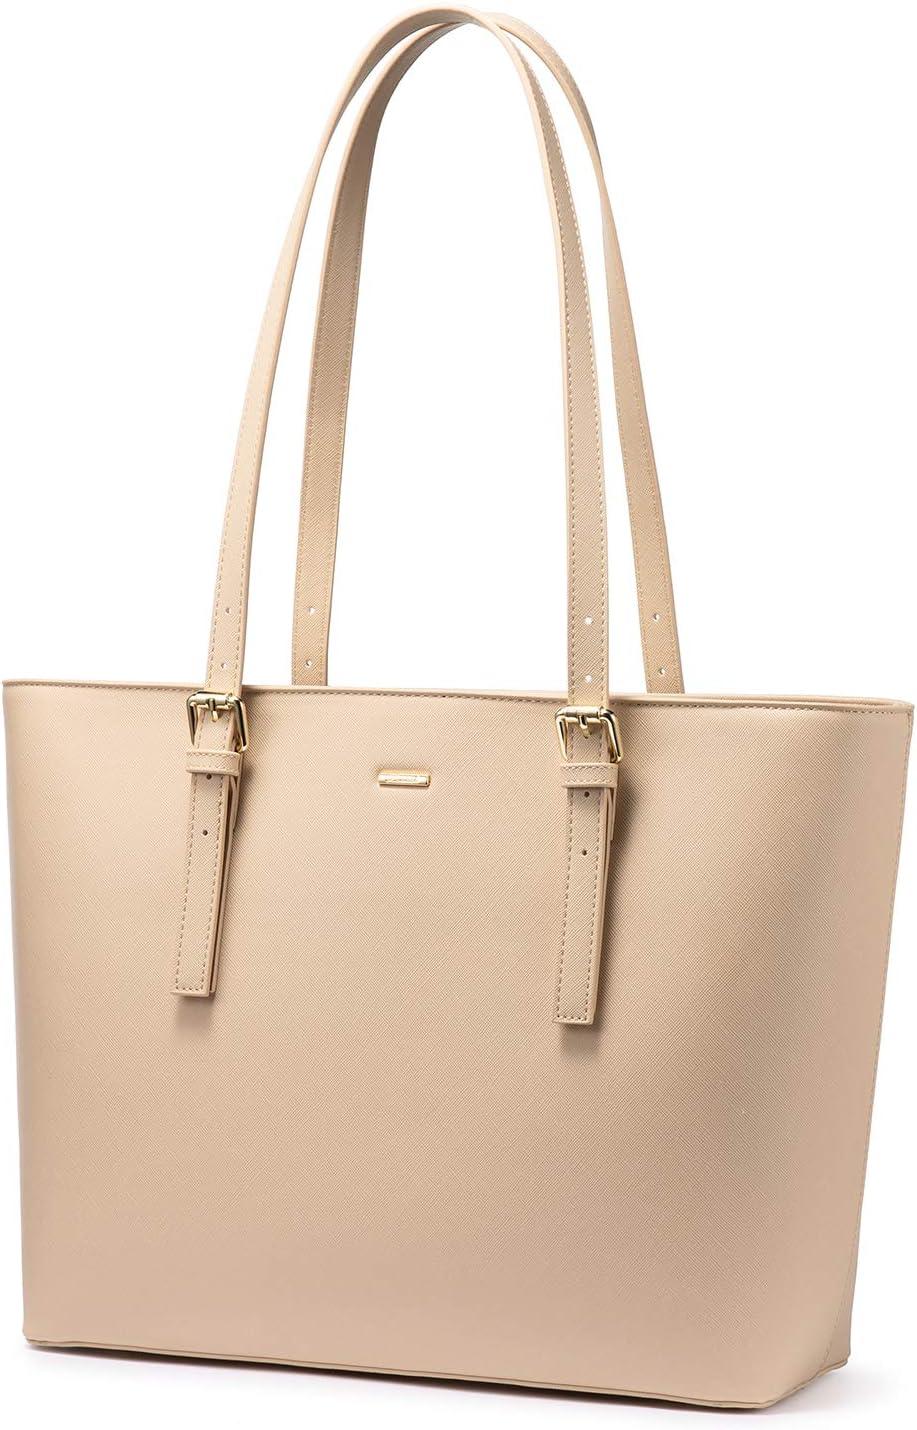 LOVEVOOK Computer Bags for Women Leather Tote Bag Laptop Handbag Work Purse, Beige